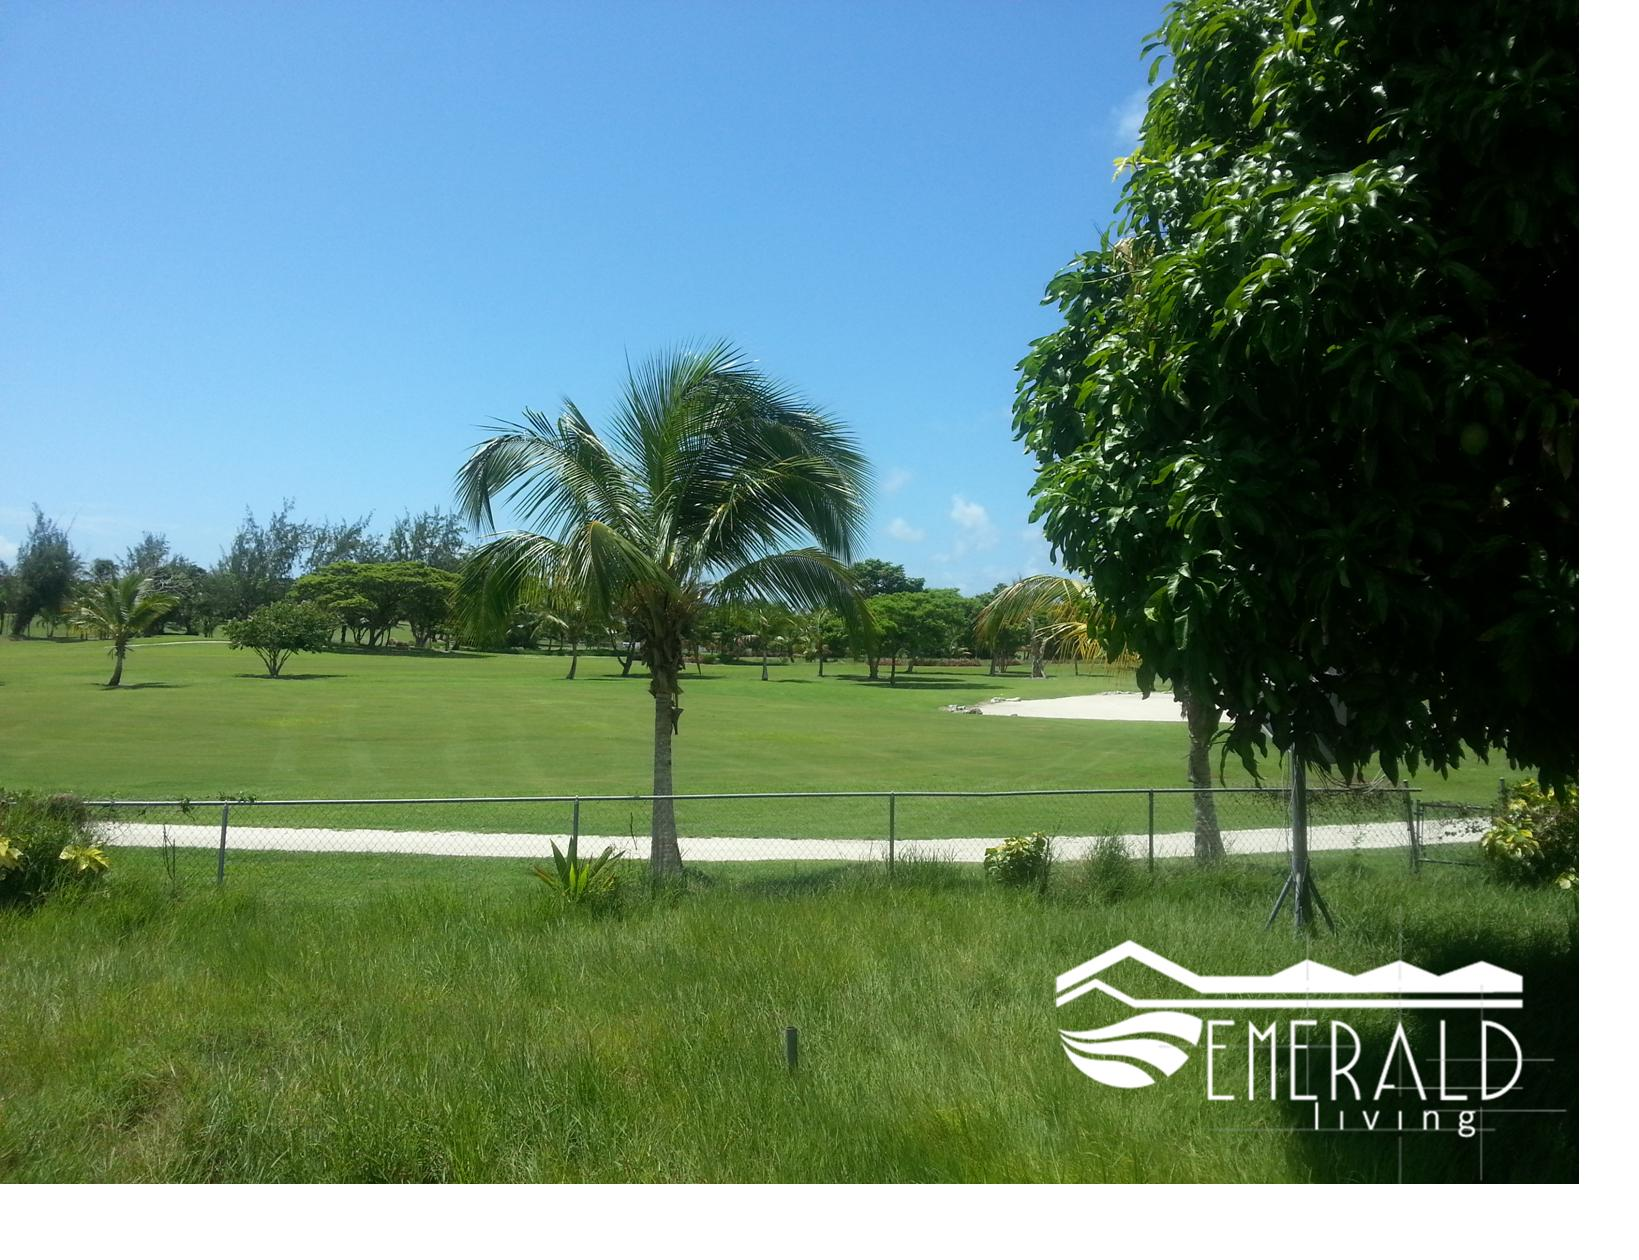 Emerald Living | Durants Golf Course